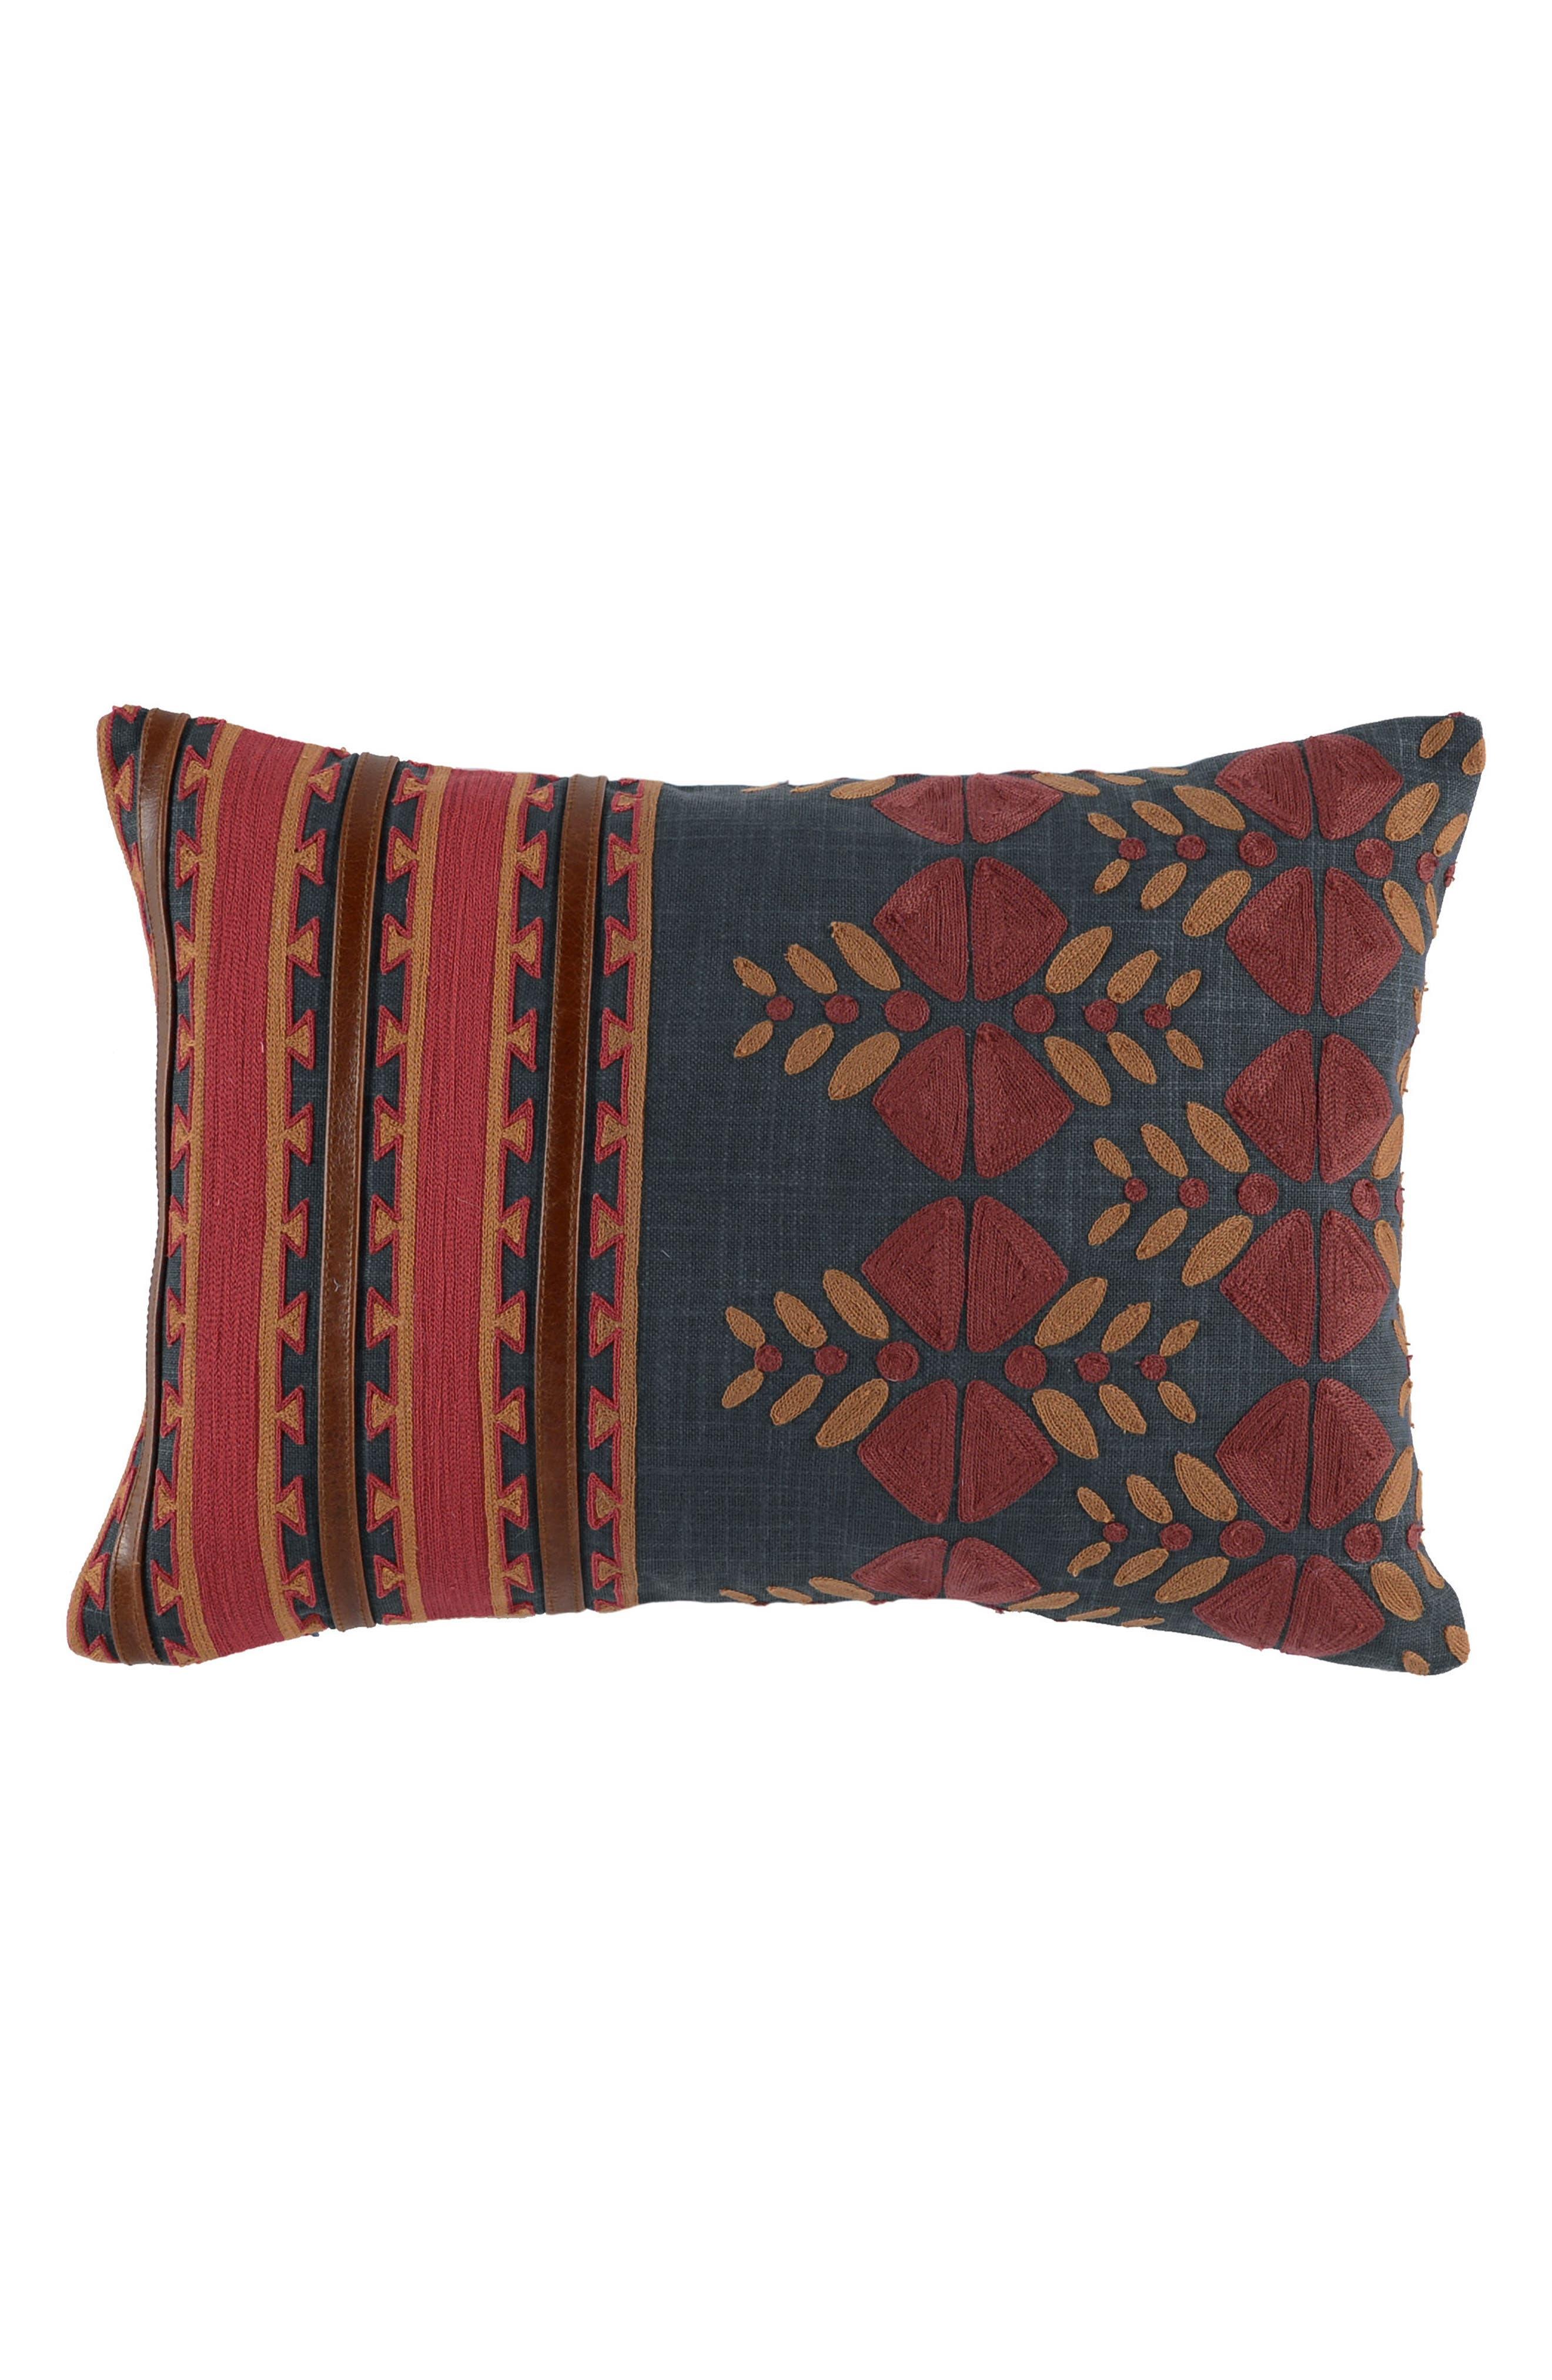 Kaleta Accent Pillow,                         Main,                         color, Red/ Navy